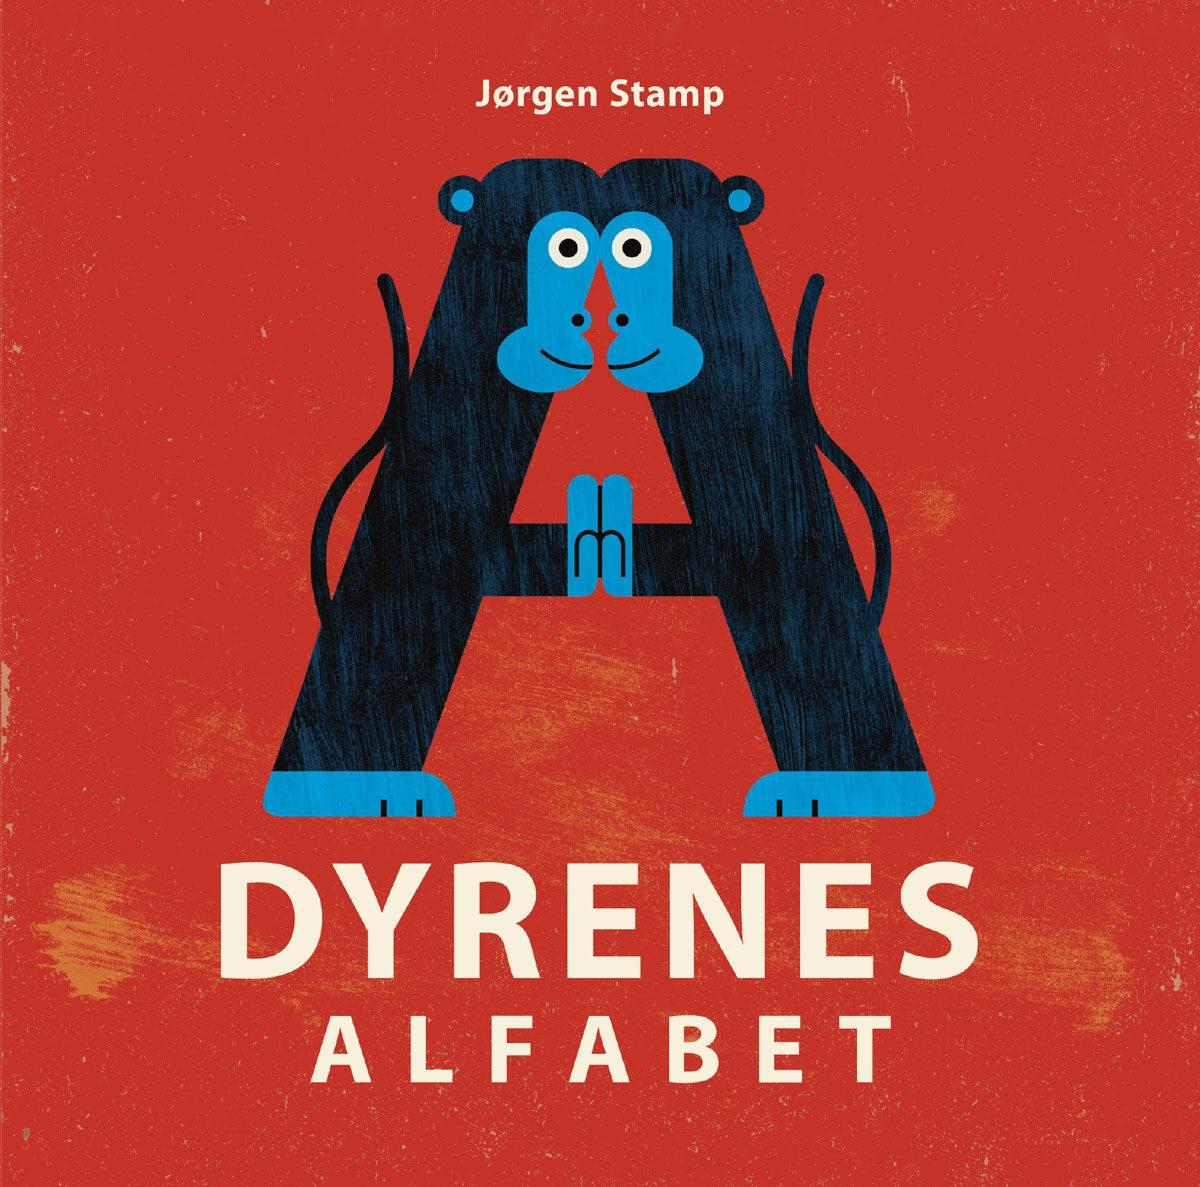 Dyrenes alfabet